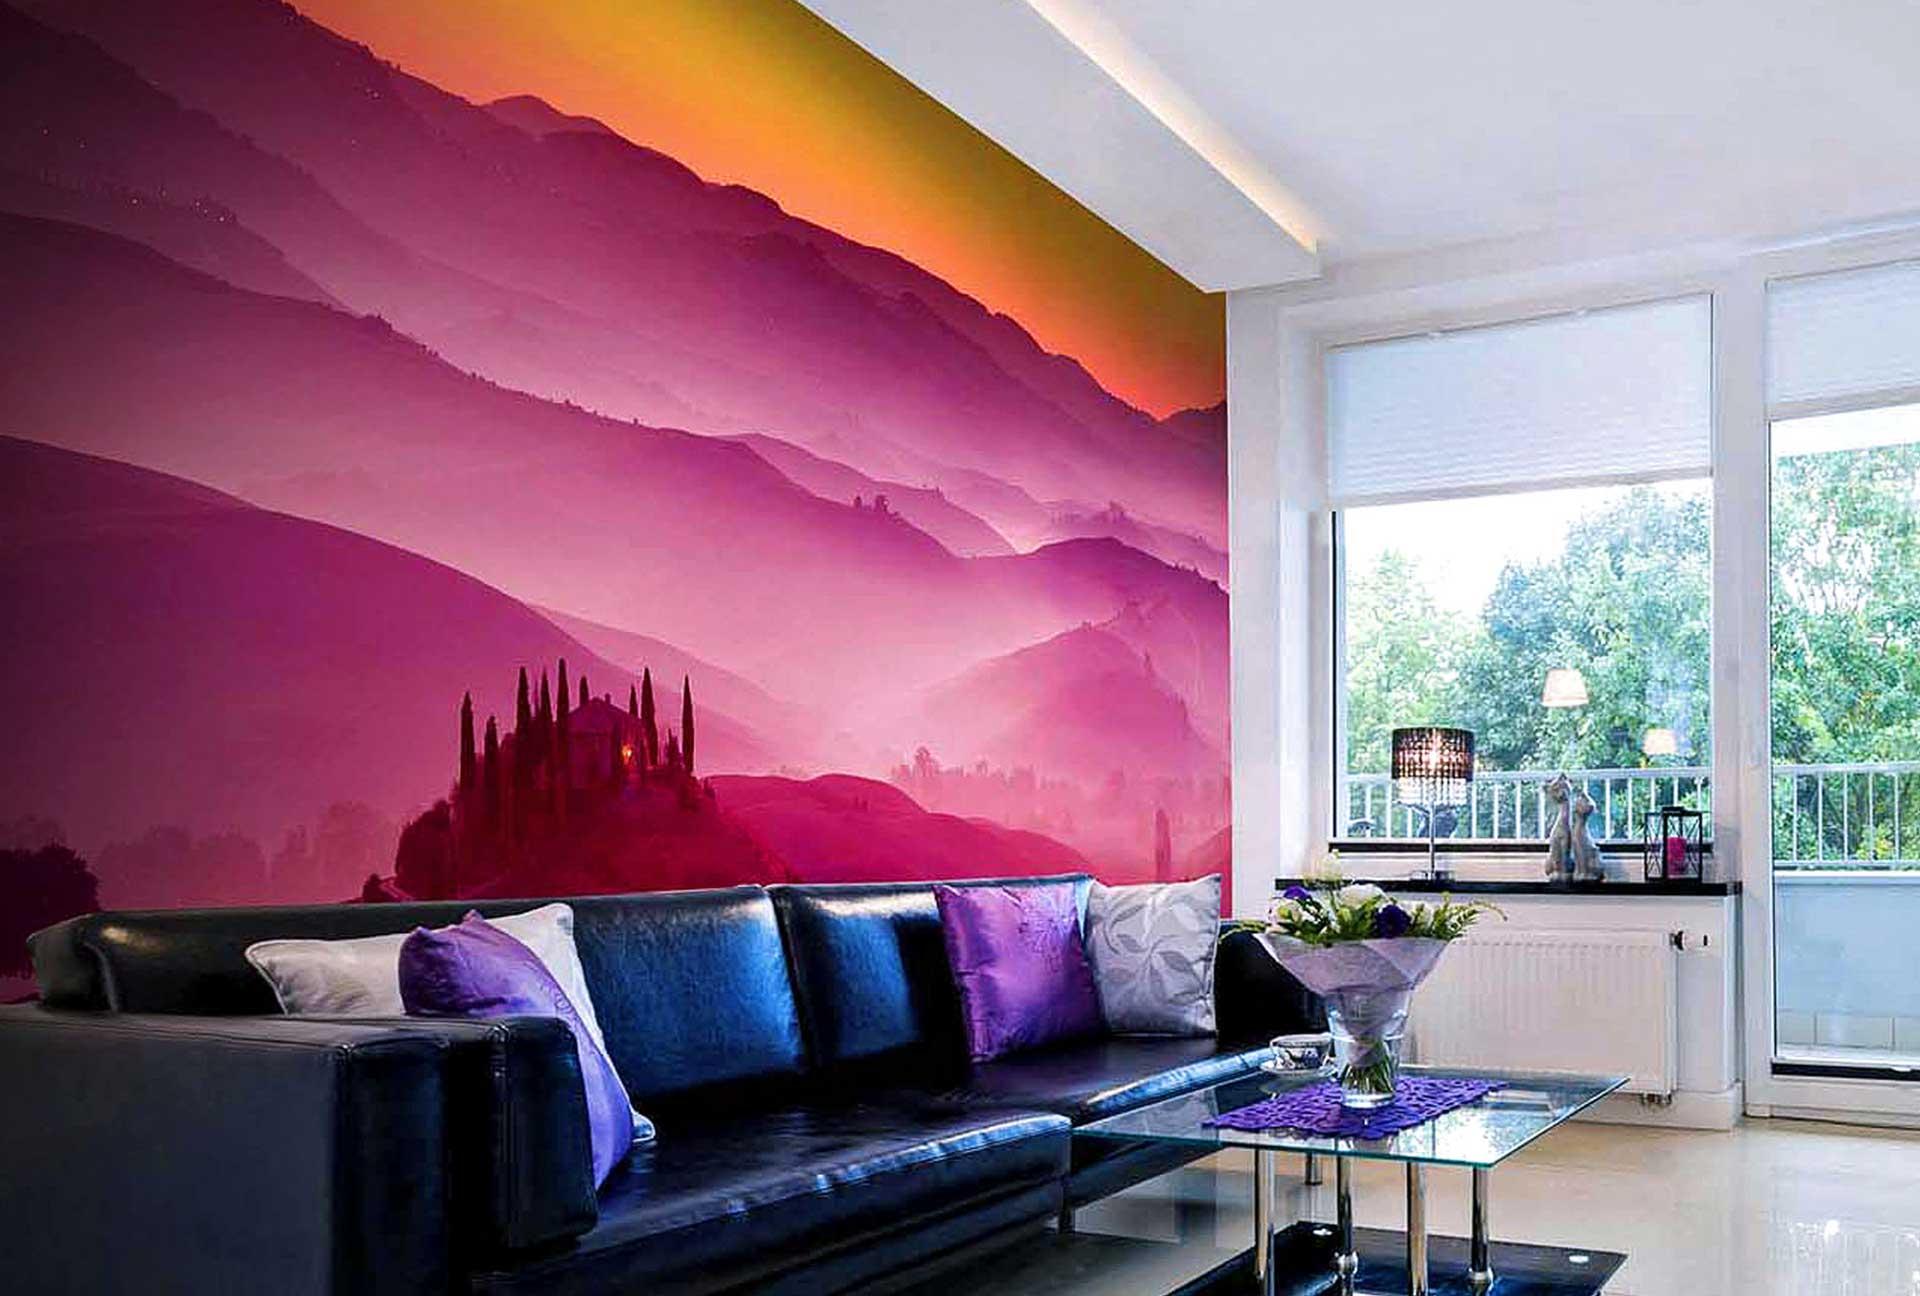 Wallpaper - Miscellaneous Wallpaper